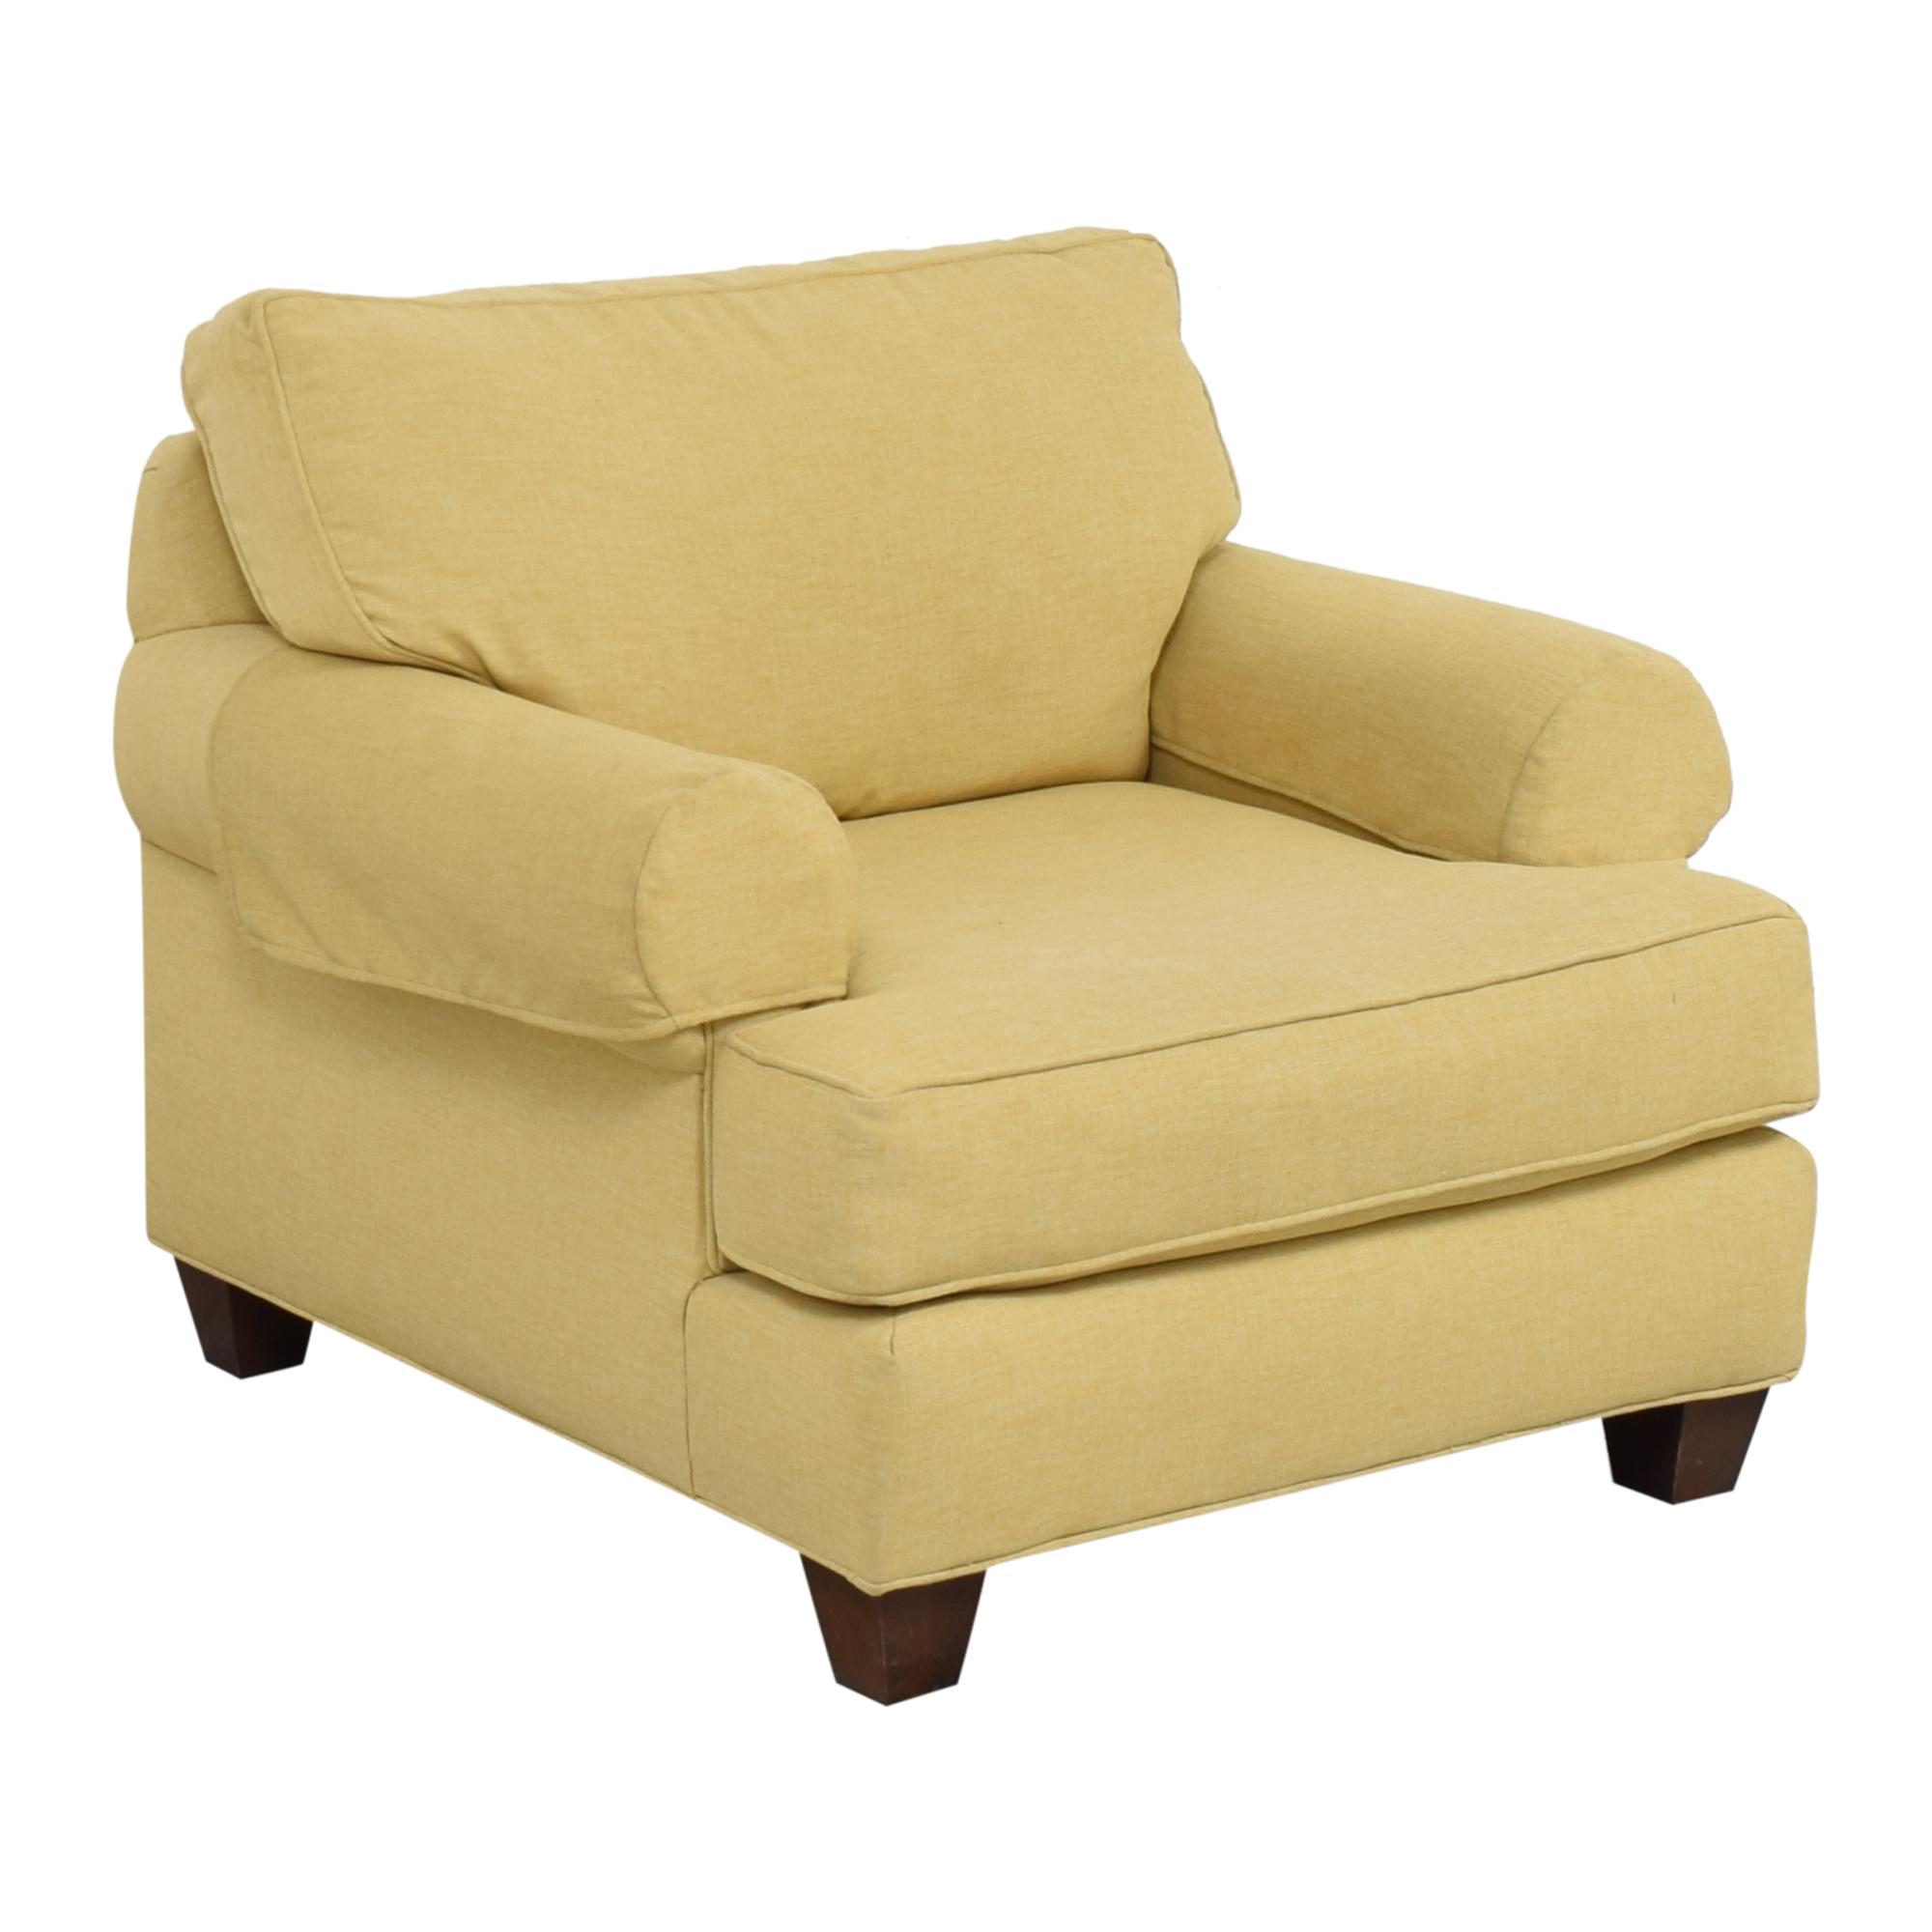 Craftmaster Furniture Craftmaster Furniture Townhouse Armchair yellow